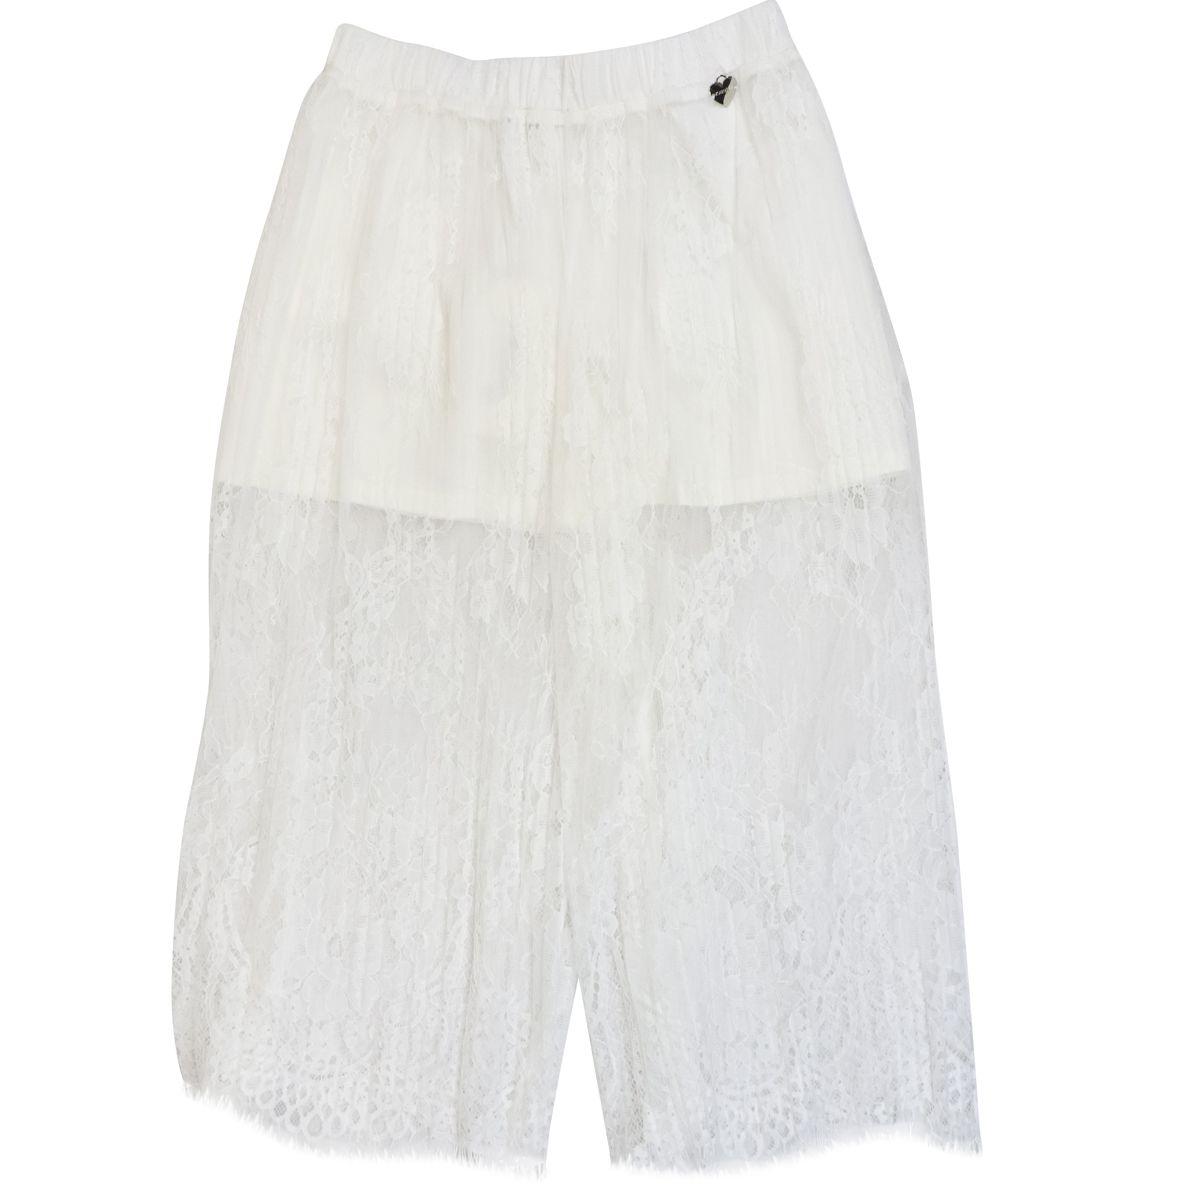 1. Twin-Set cropped lace trousers White Twin-Set